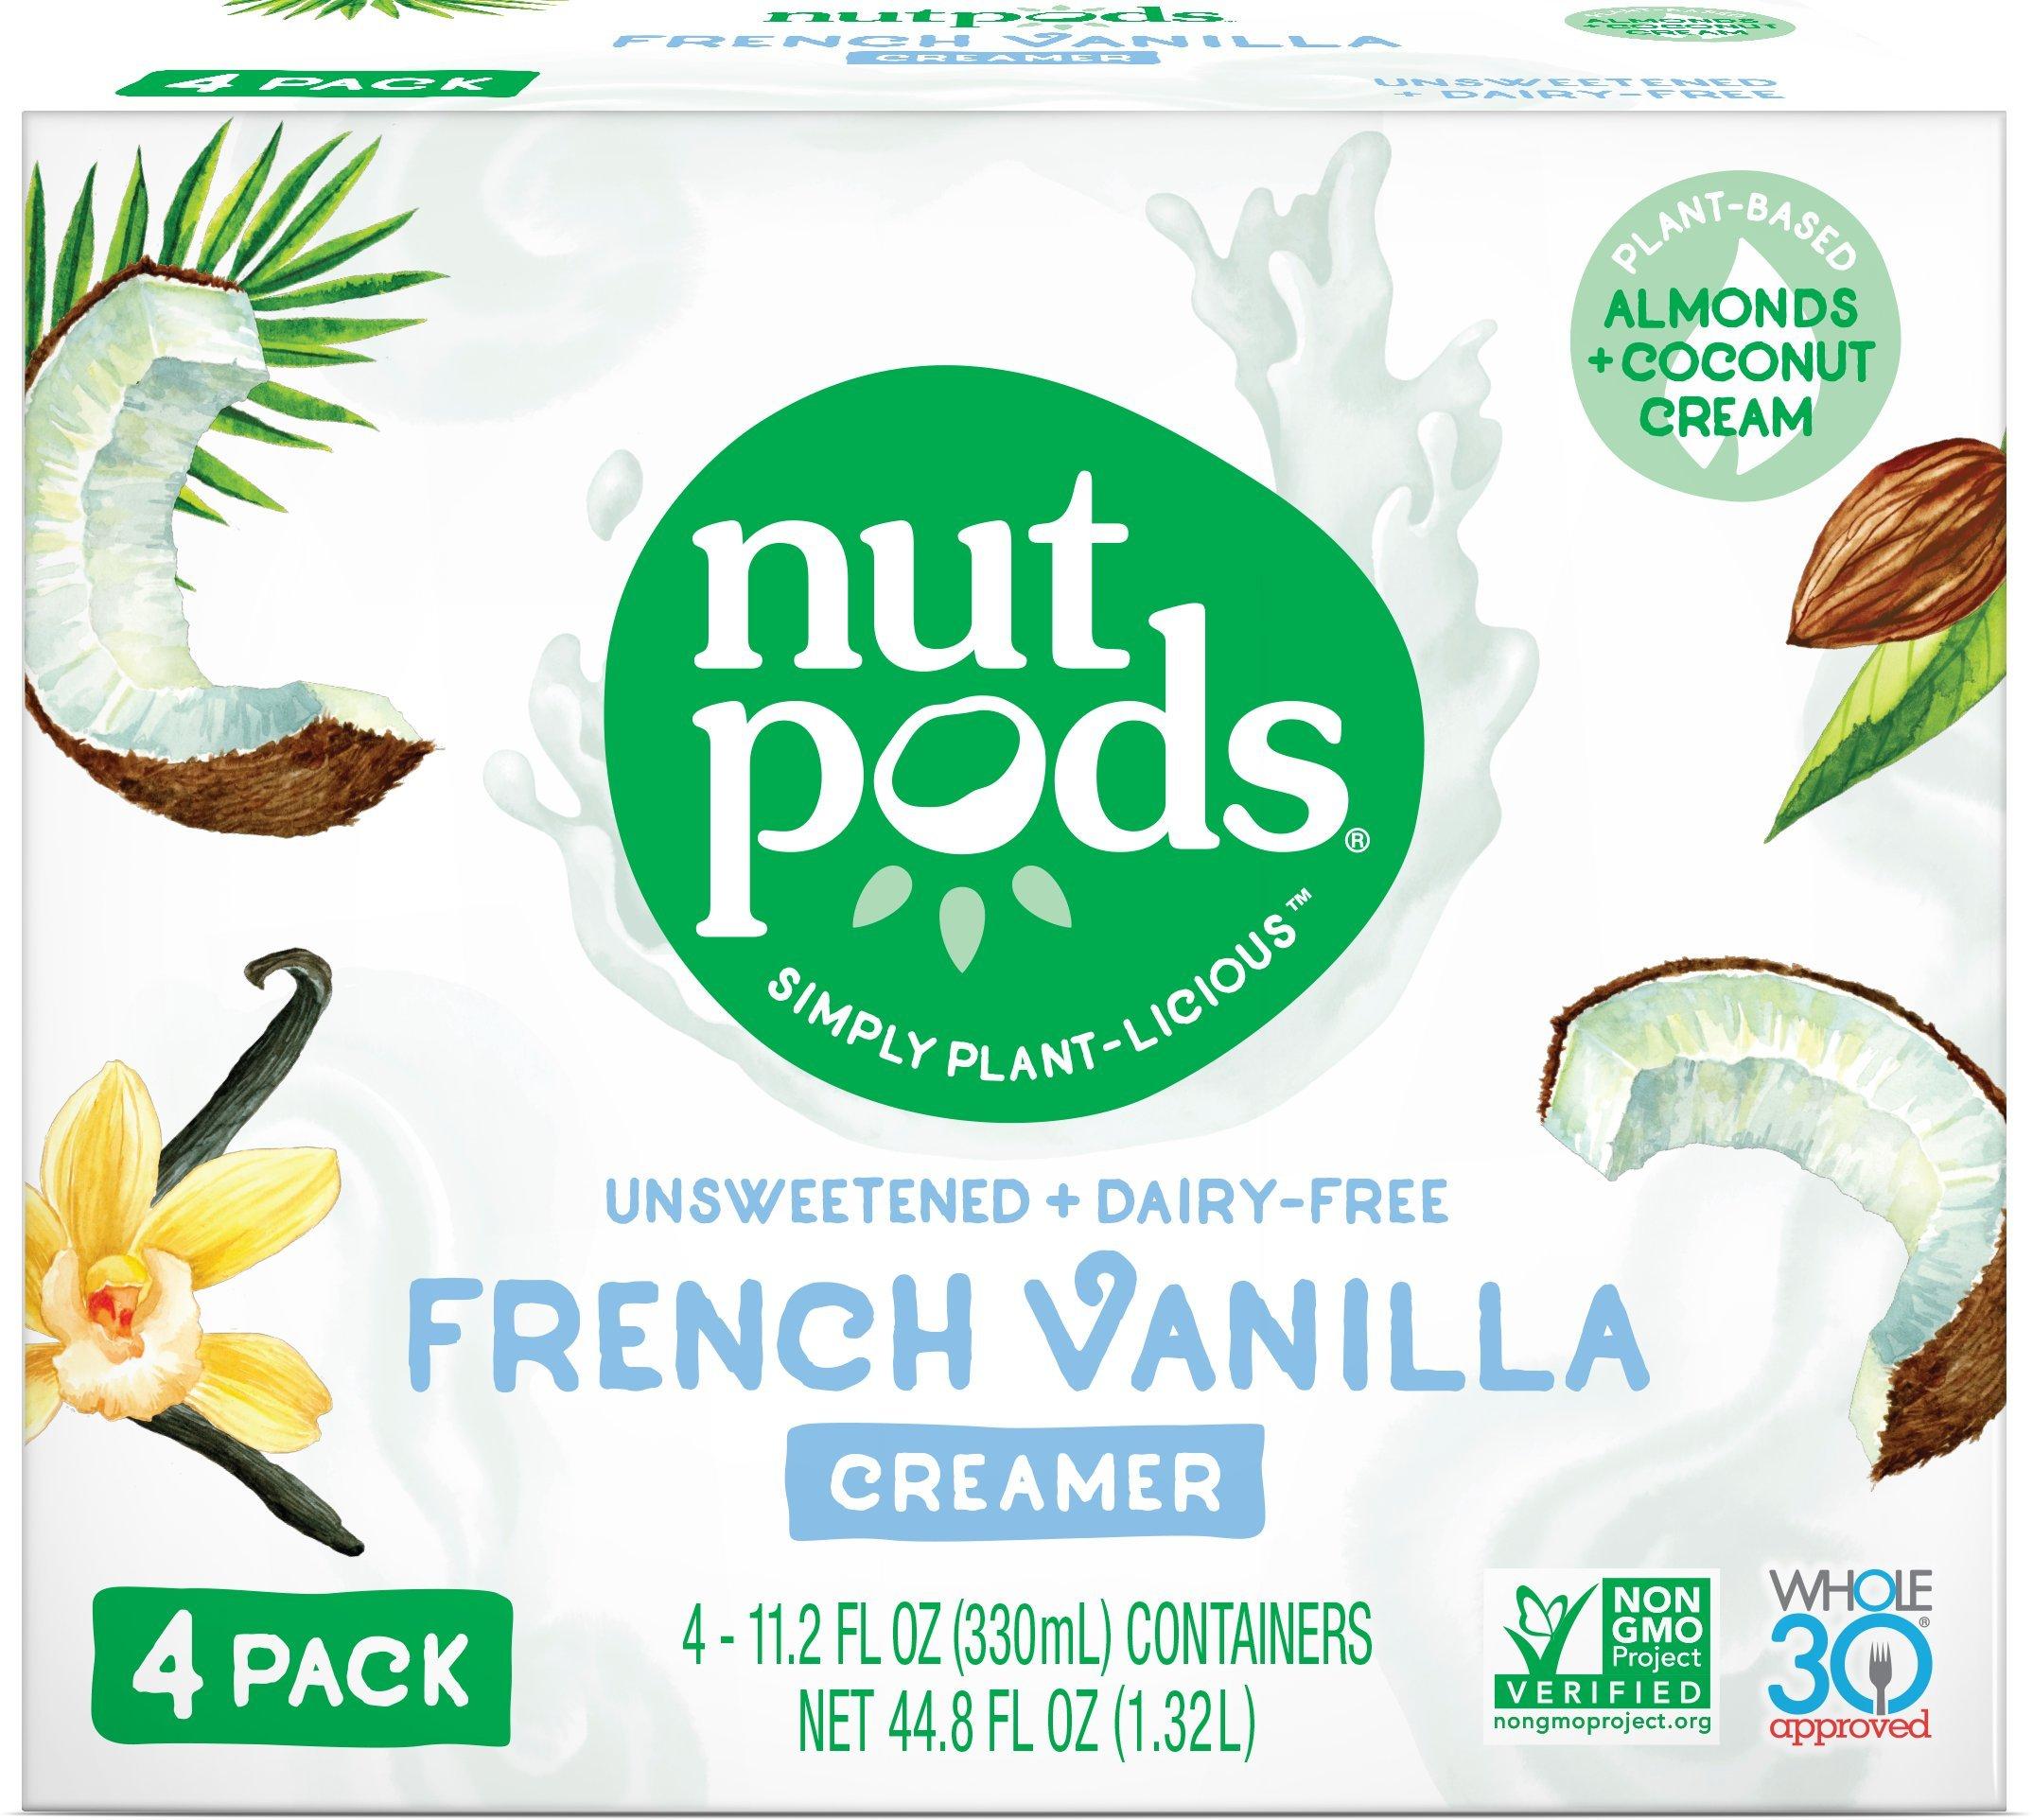 nutpods French Vanilla Dairy-Free Creamer (4-pack) Unsweetened Whole30/Paleo/Keto/Vegan